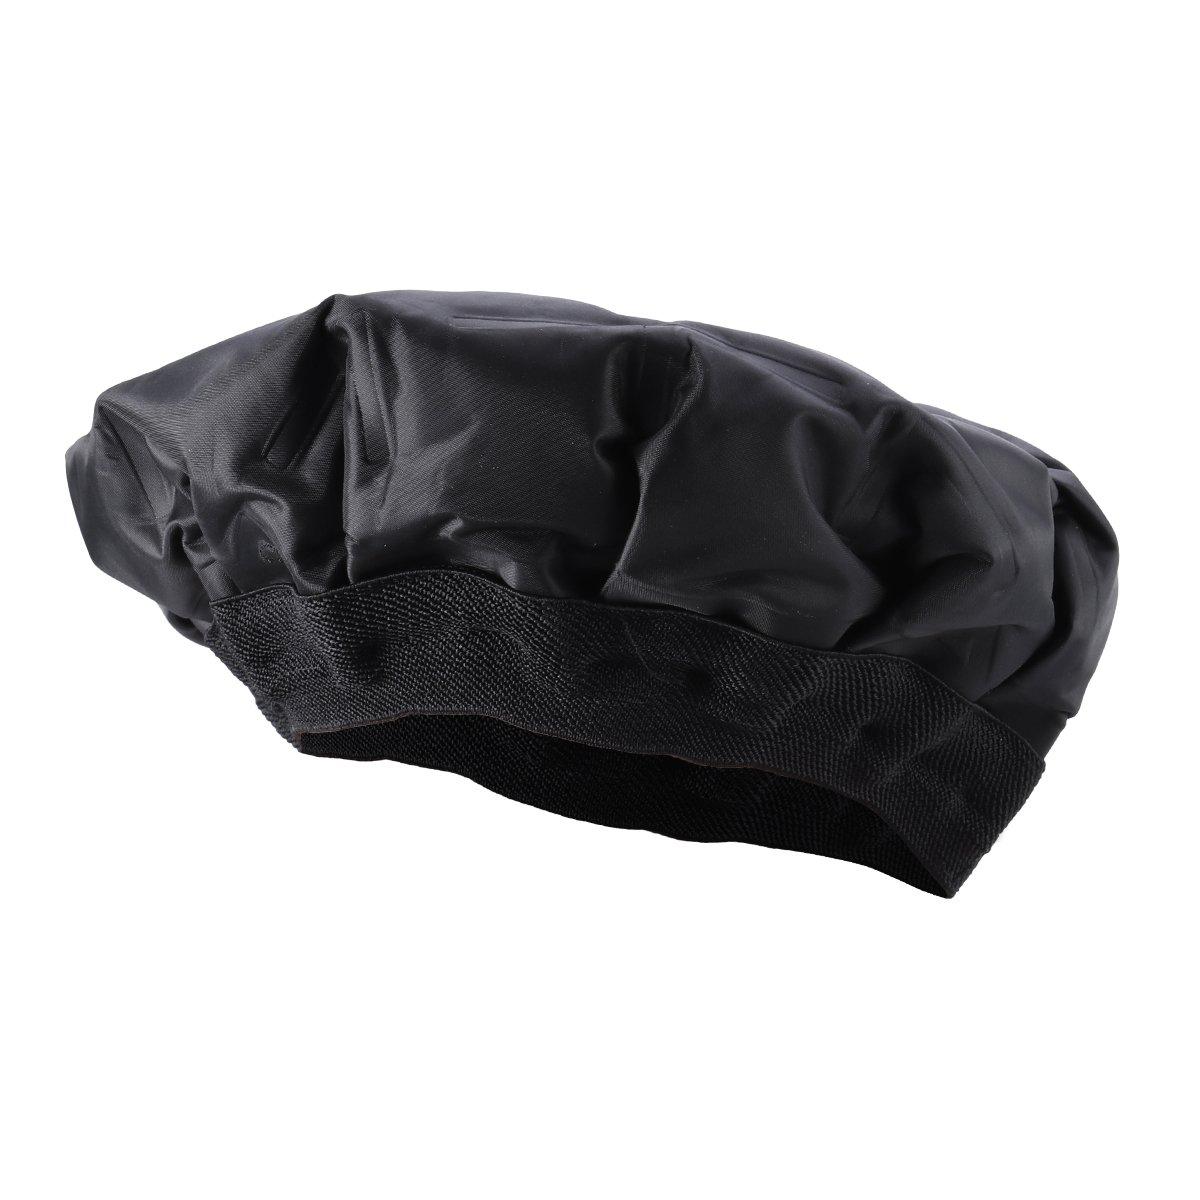 ROSENICE Heat Cap Microwavable Micro Hair Cap Durable Hair Thermal Treatment Cap for Hair Styling (Black)